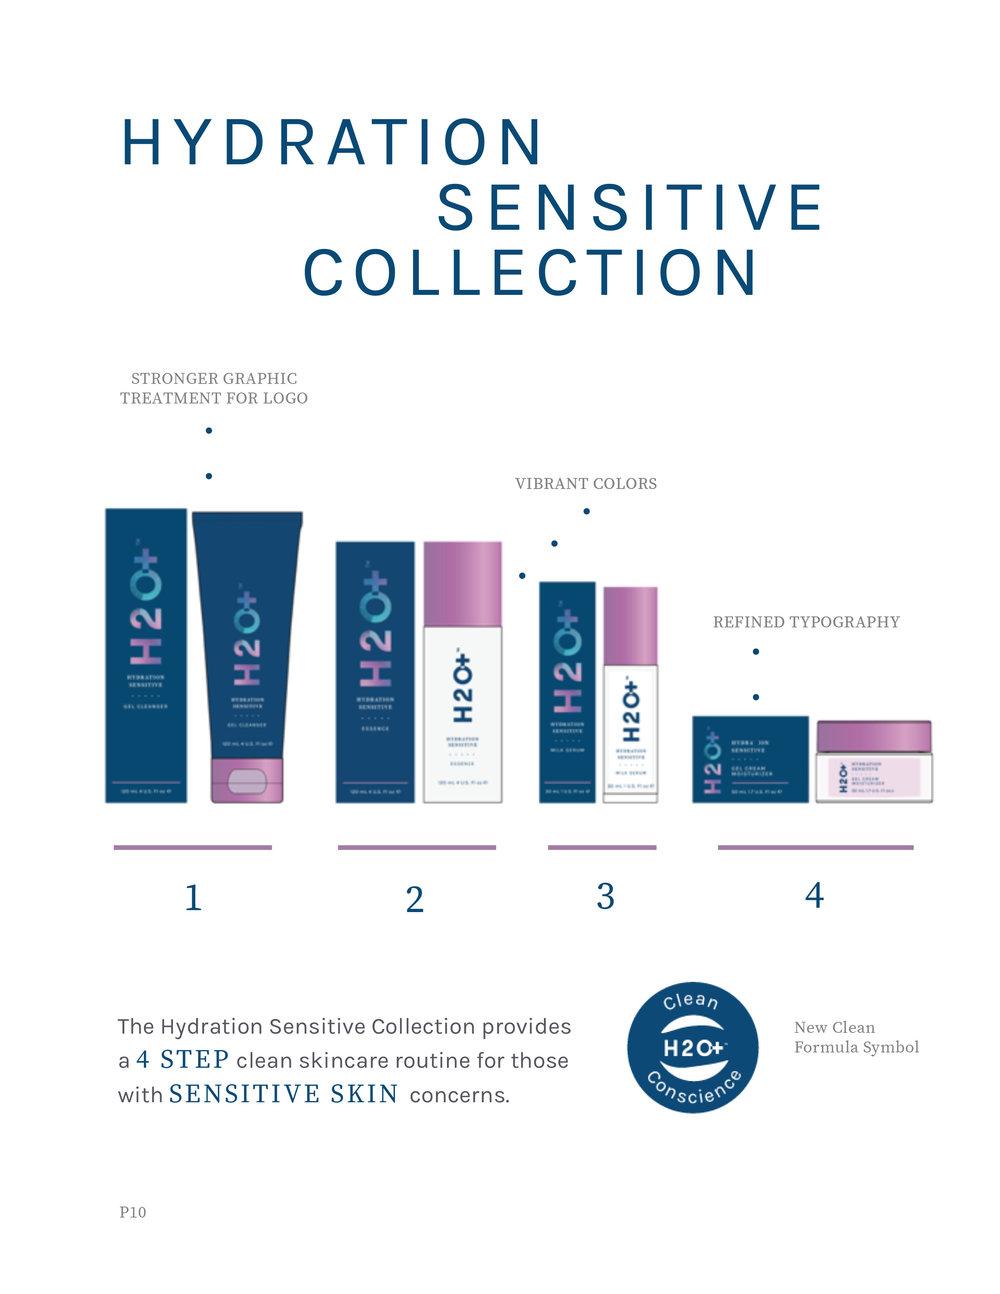 H2O+ Brand Style Guide_04051910.jpg